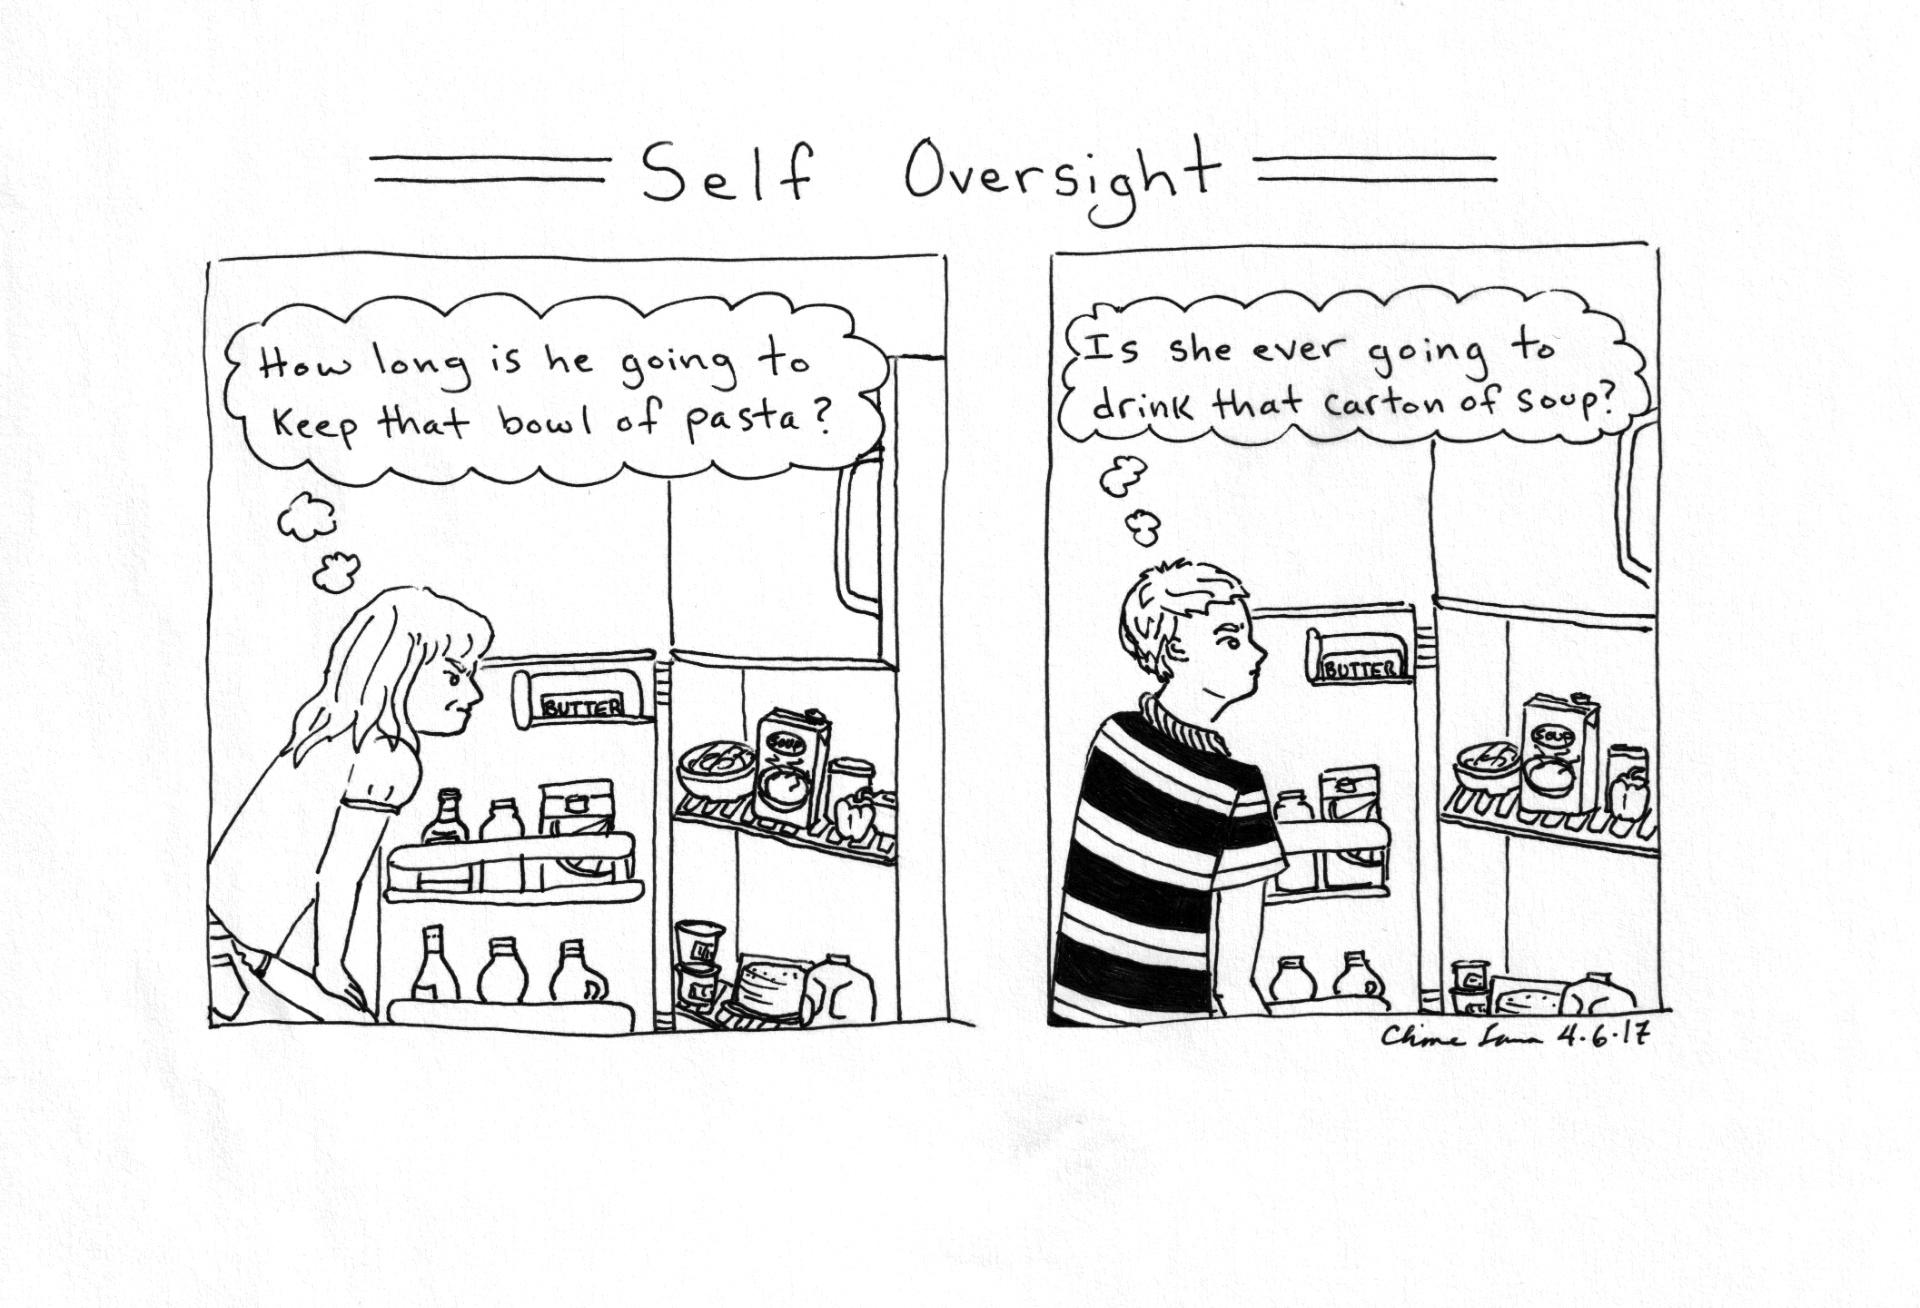 SelfOversight-ChimeLama